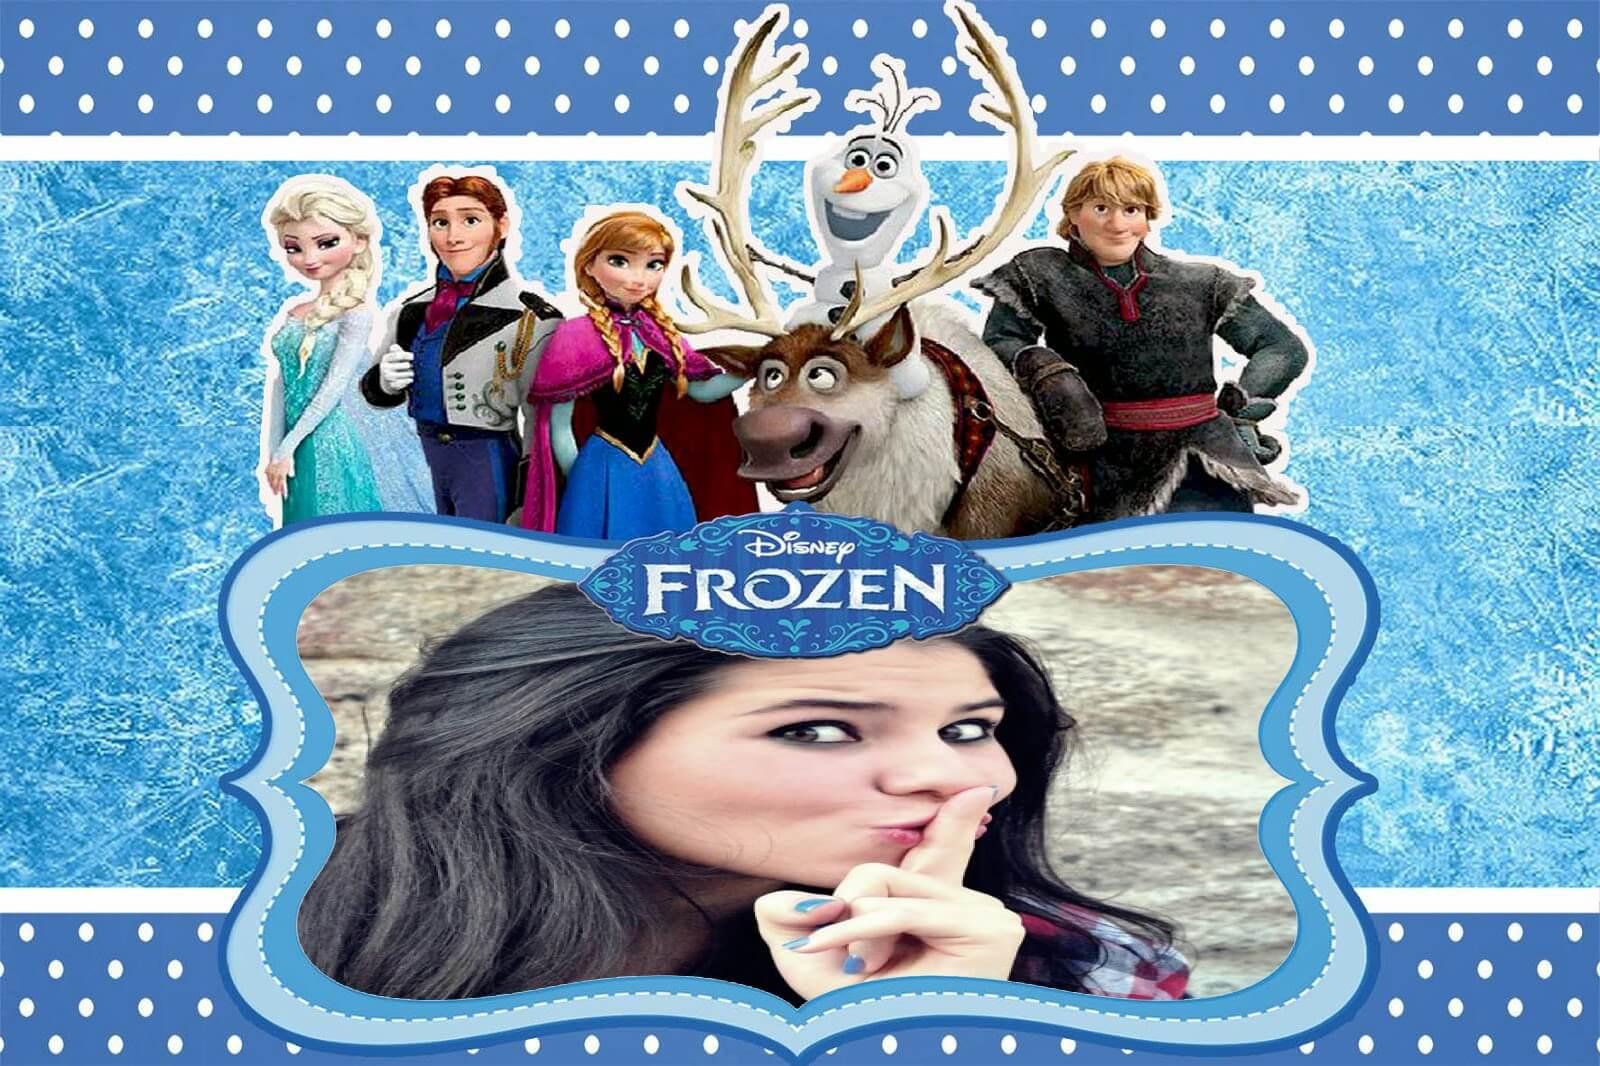 moldura-online-do-filme-frozen